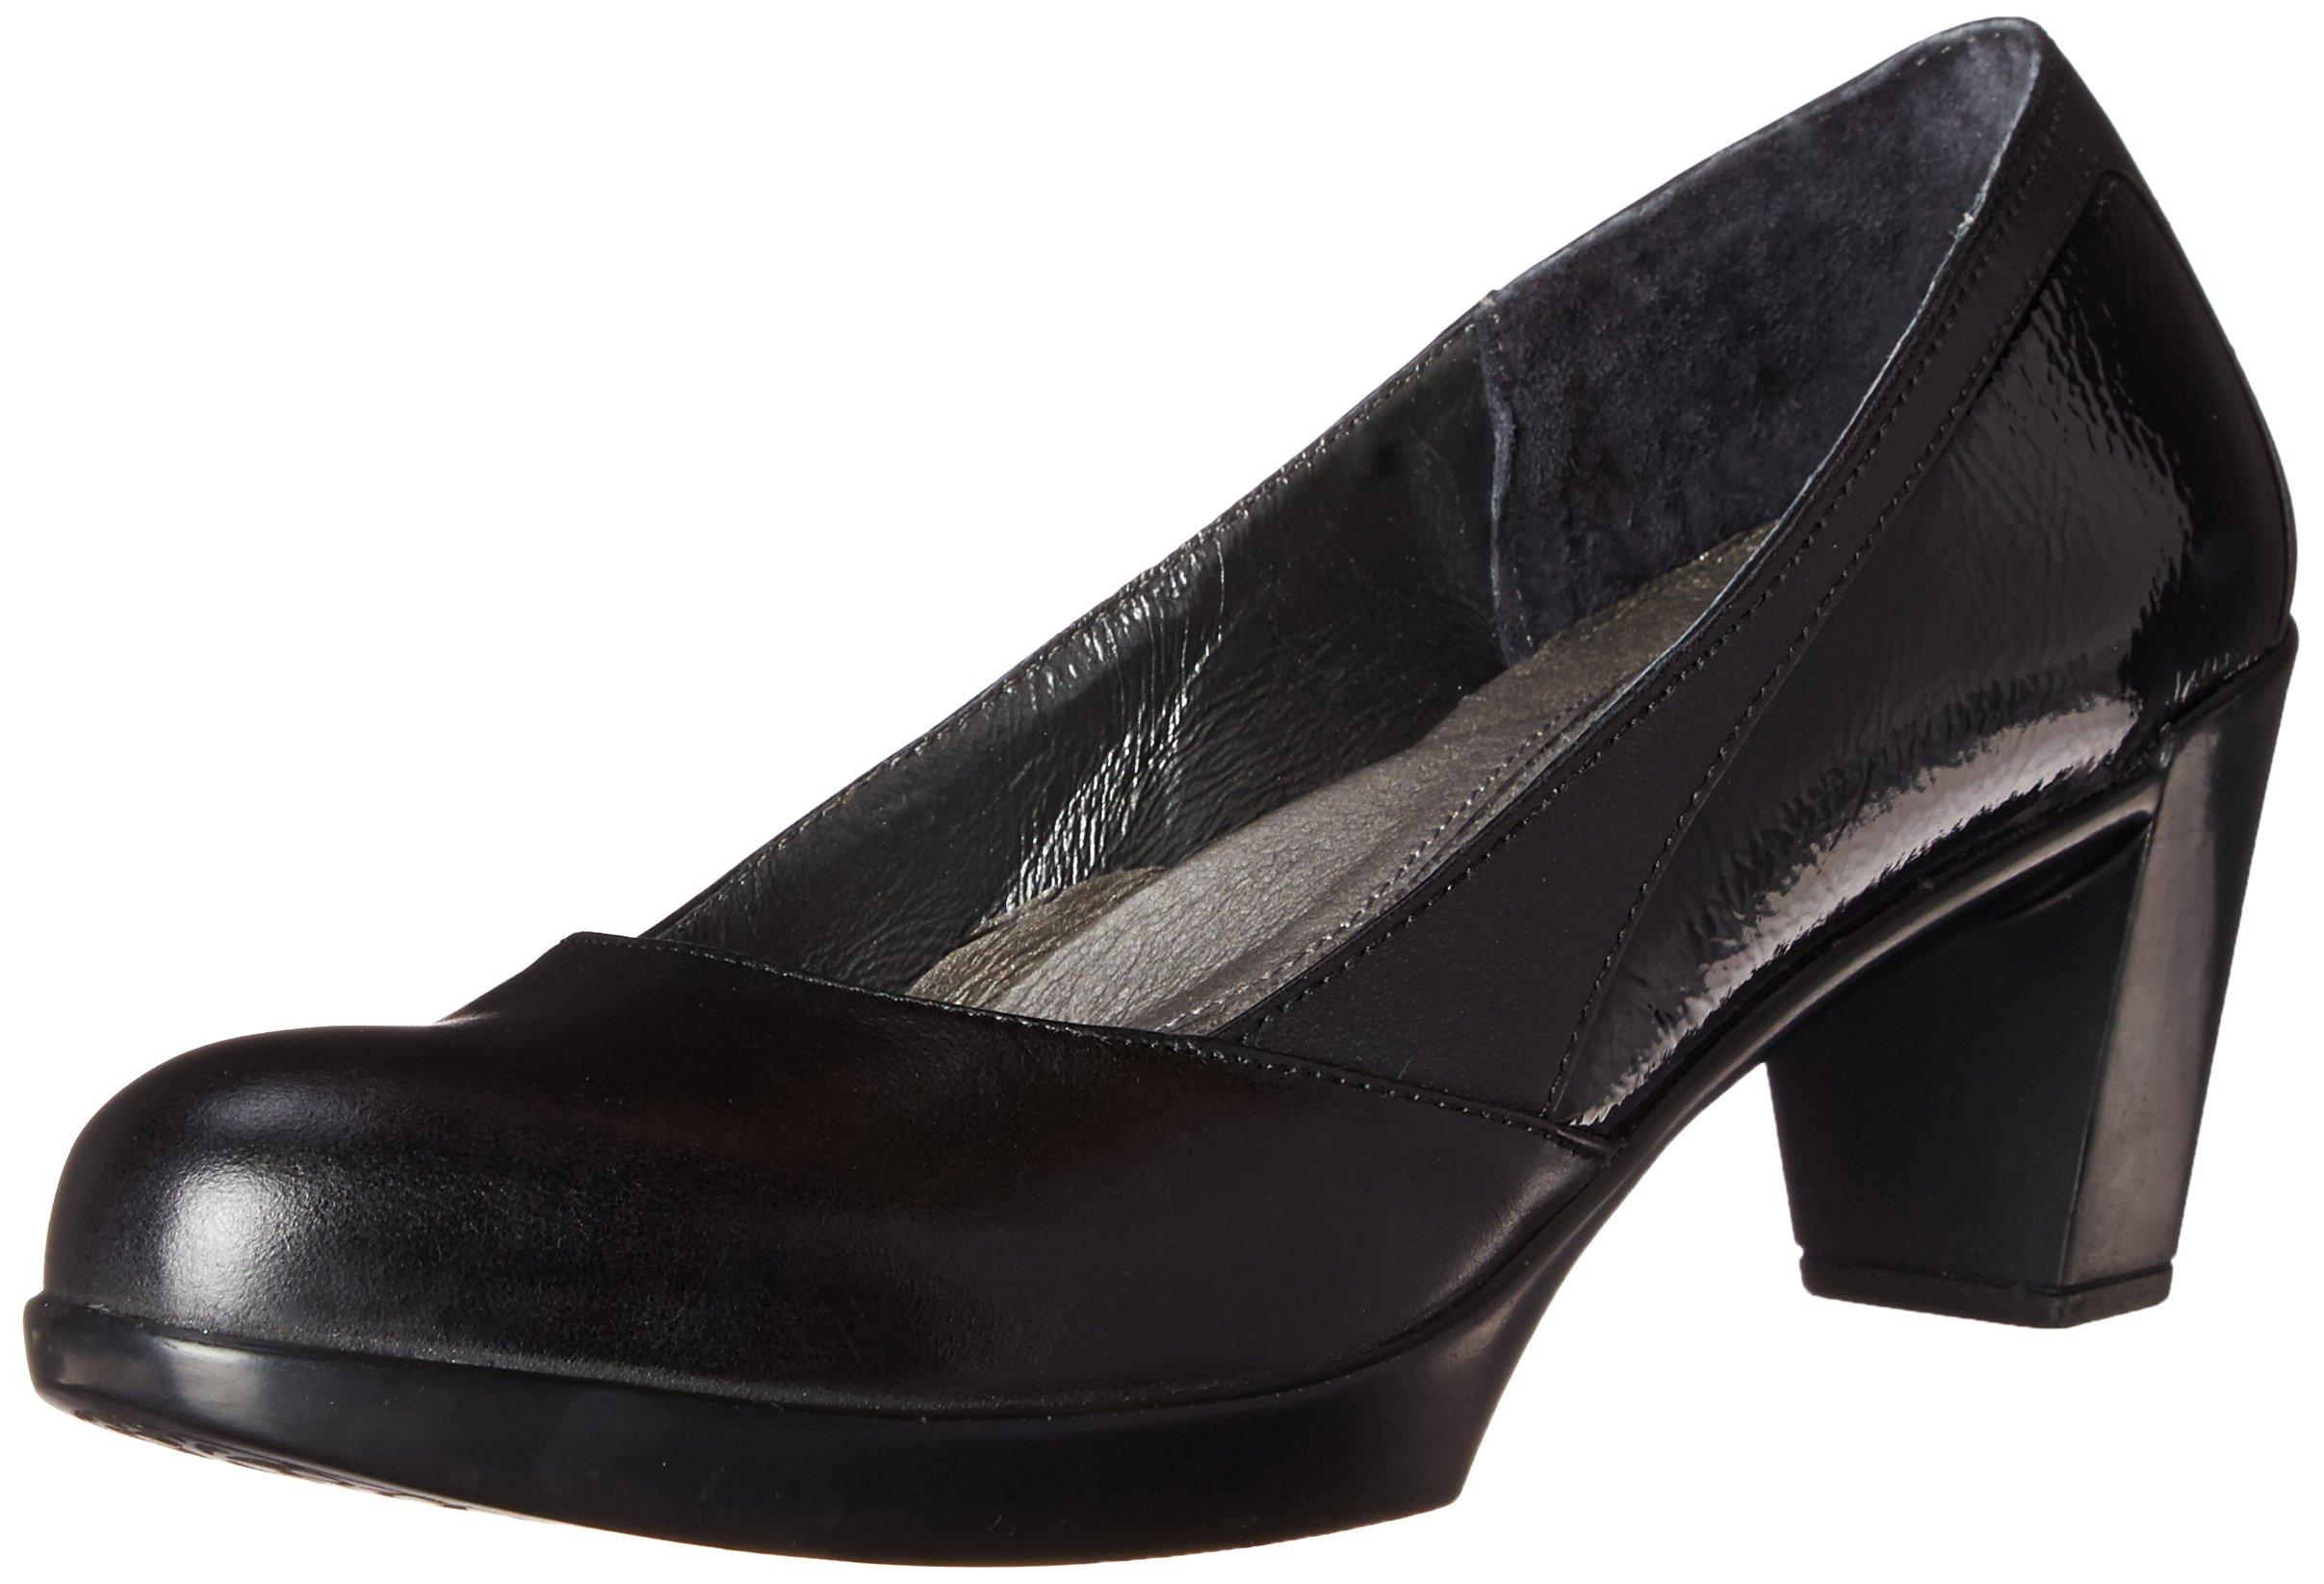 Naot Women's Diamanti Dress Pump, Black Madras Leather/Black Raven Leather/Black Crinkle Patent Leather, 37 EU/6-6.5 M US by NAOT